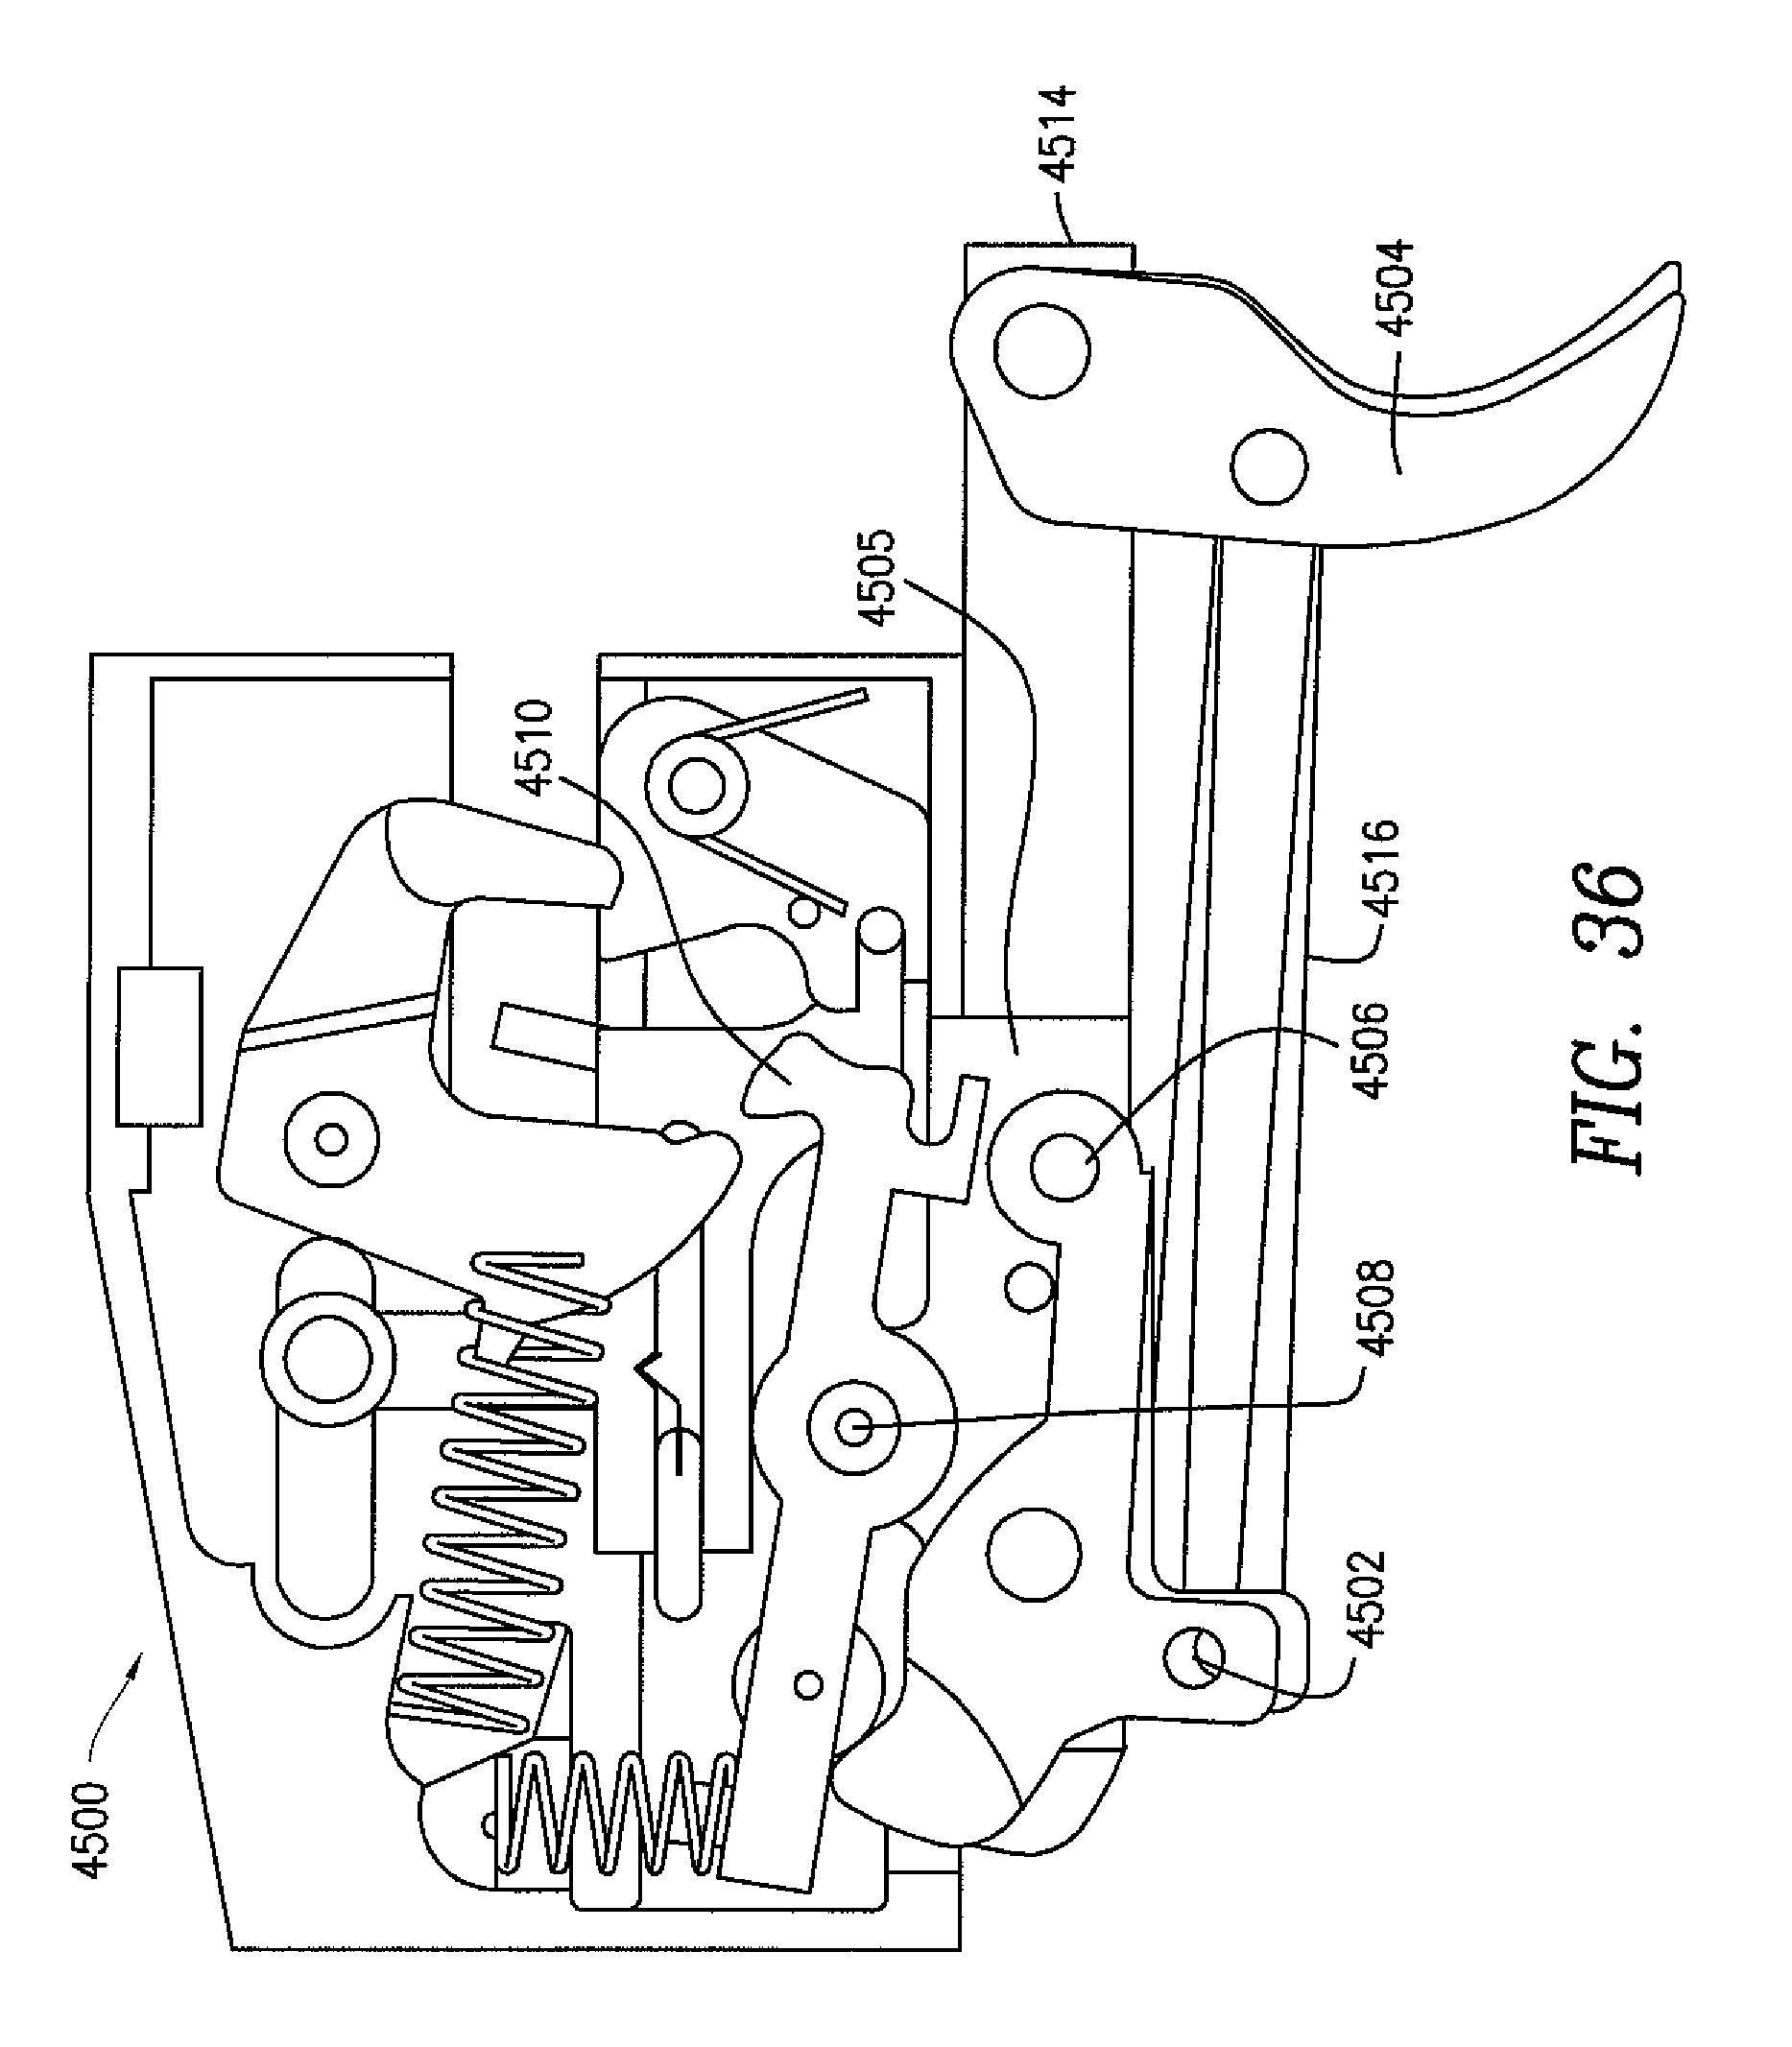 barnett crossbow parts schematic